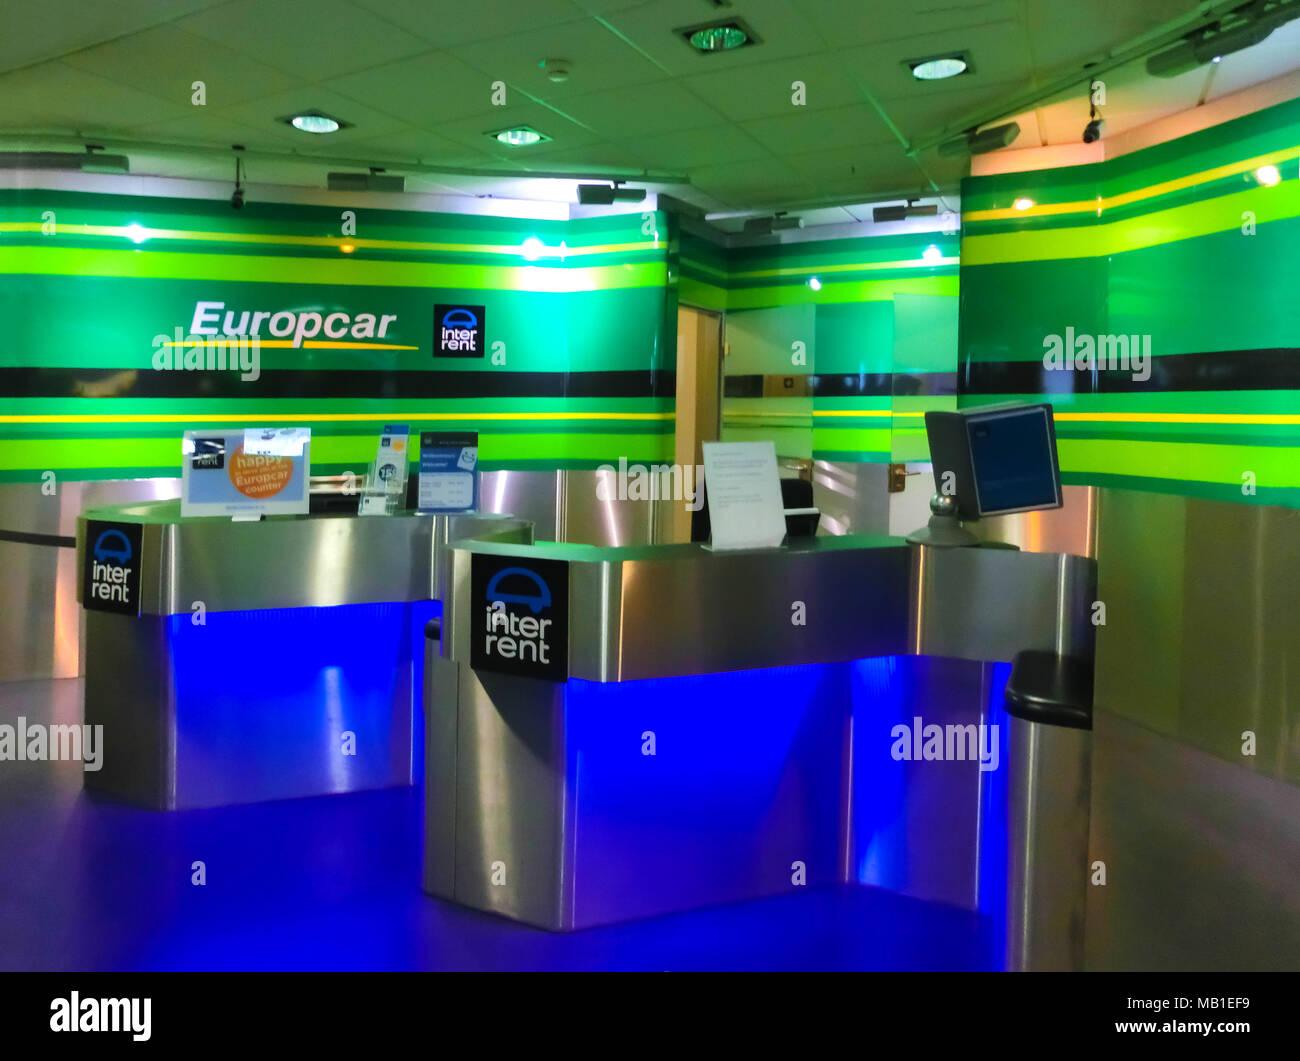 Colonia, Germania - 12 dicembre 2017: autonoleggio Europcar office a Frankfurt Hahn Airport in Germania. Immagini Stock